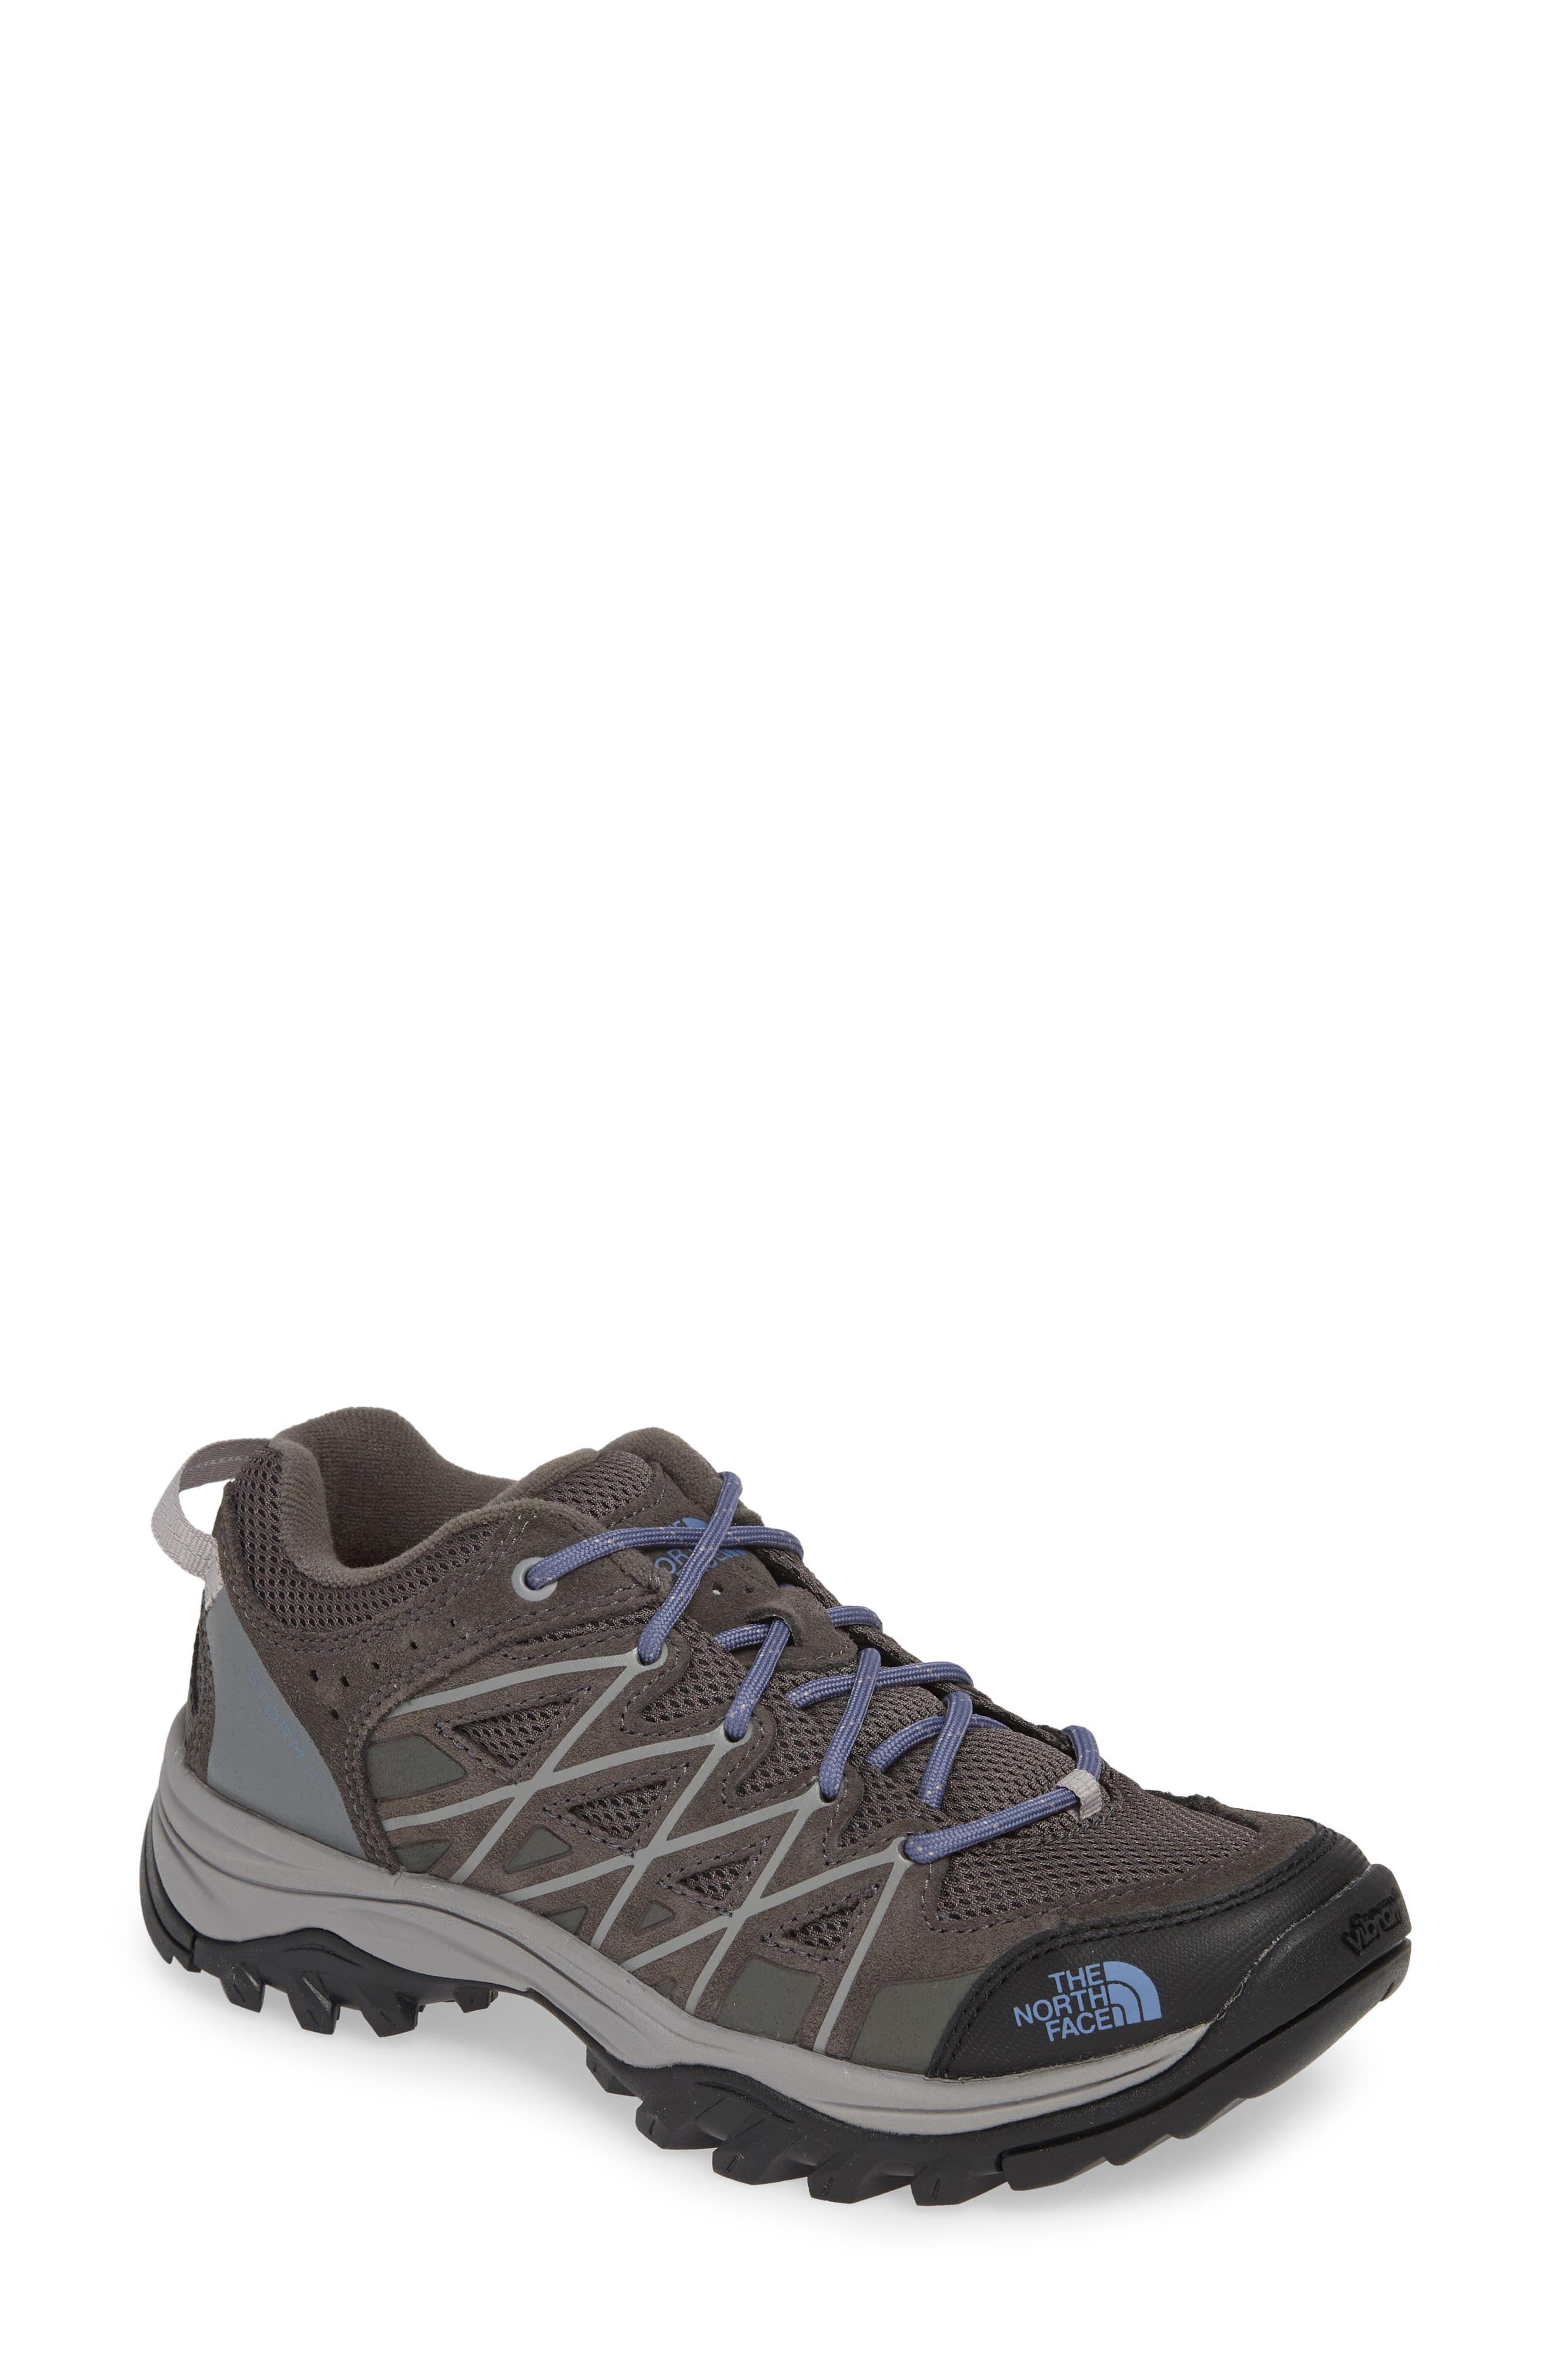 26b63941c Women's The North Face Storm Iii Waterproof Hiking Sneaker, Size 8 M ...